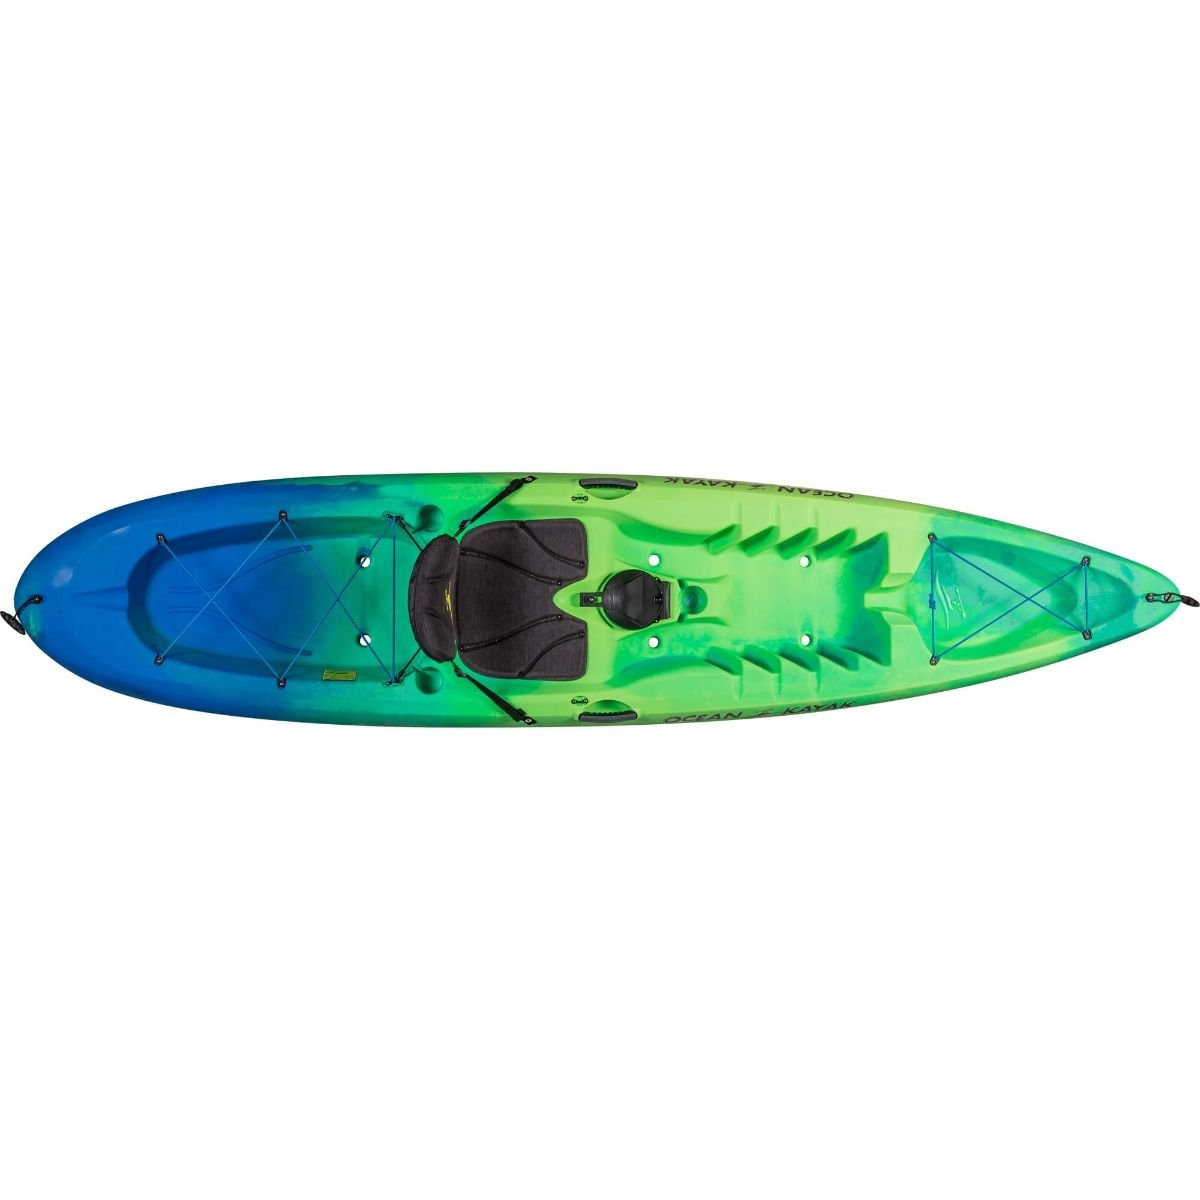 Ocean Kayak Malibu 11.5 Sit-On-Top Kayak - Ahi